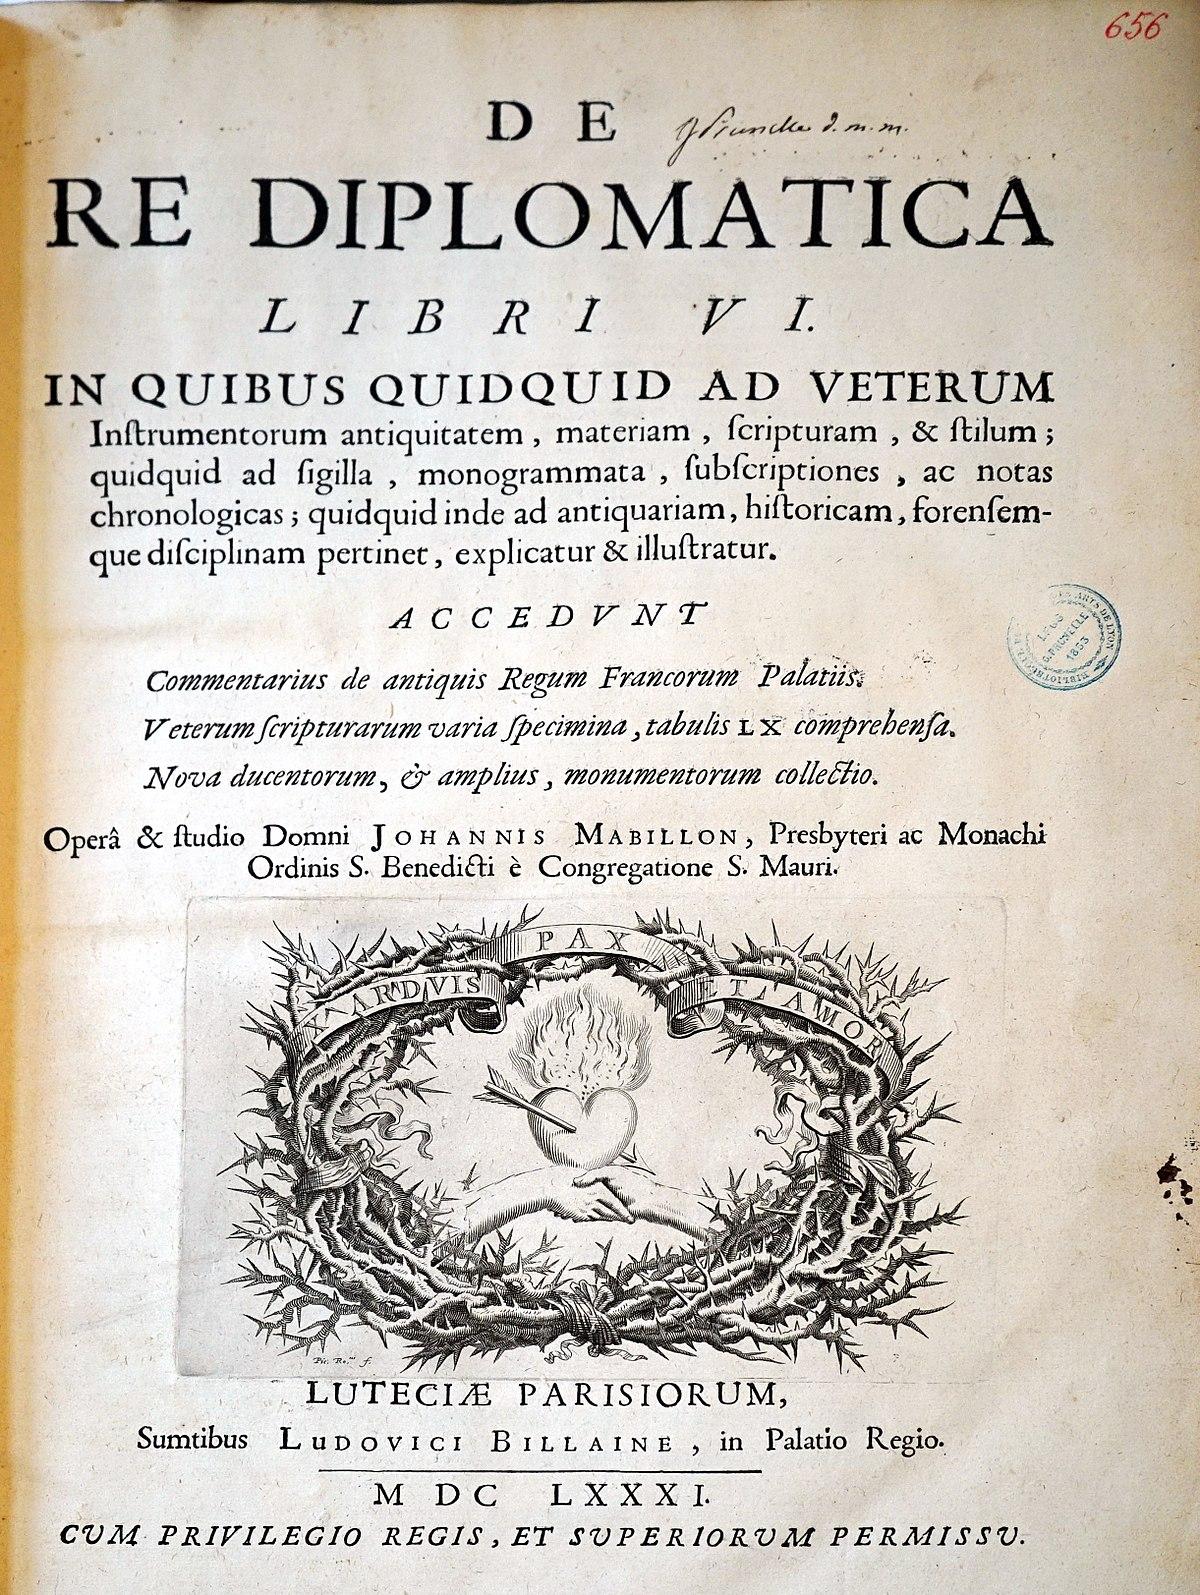 De re diplomatica 17765.jpg